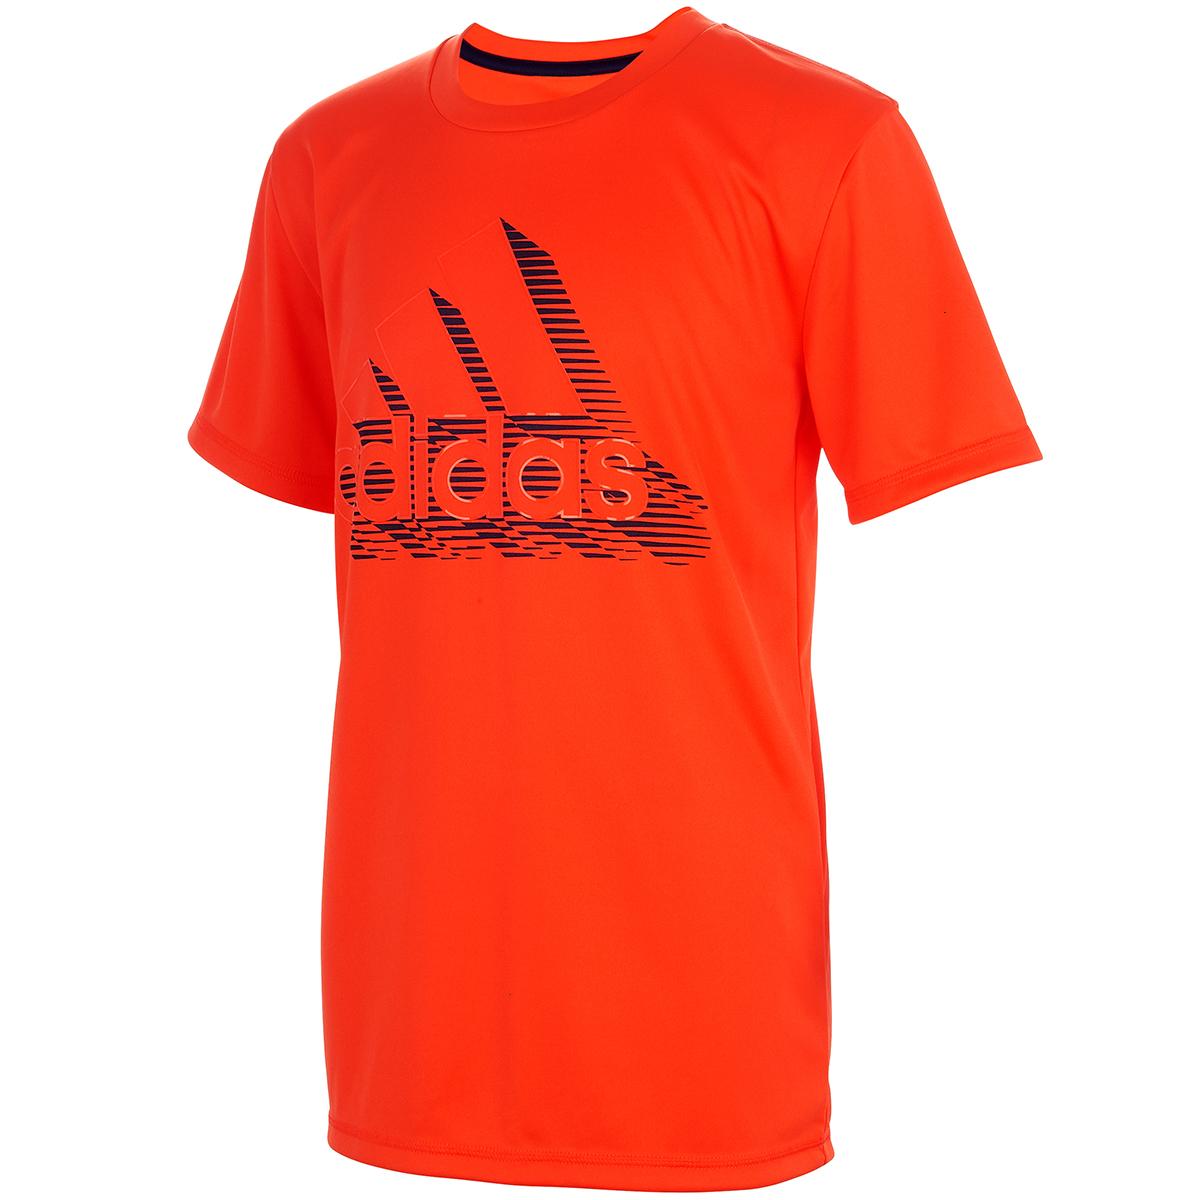 Adidas Boys' Badge Of Sport Short-Sleeve Tee - Orange, XL